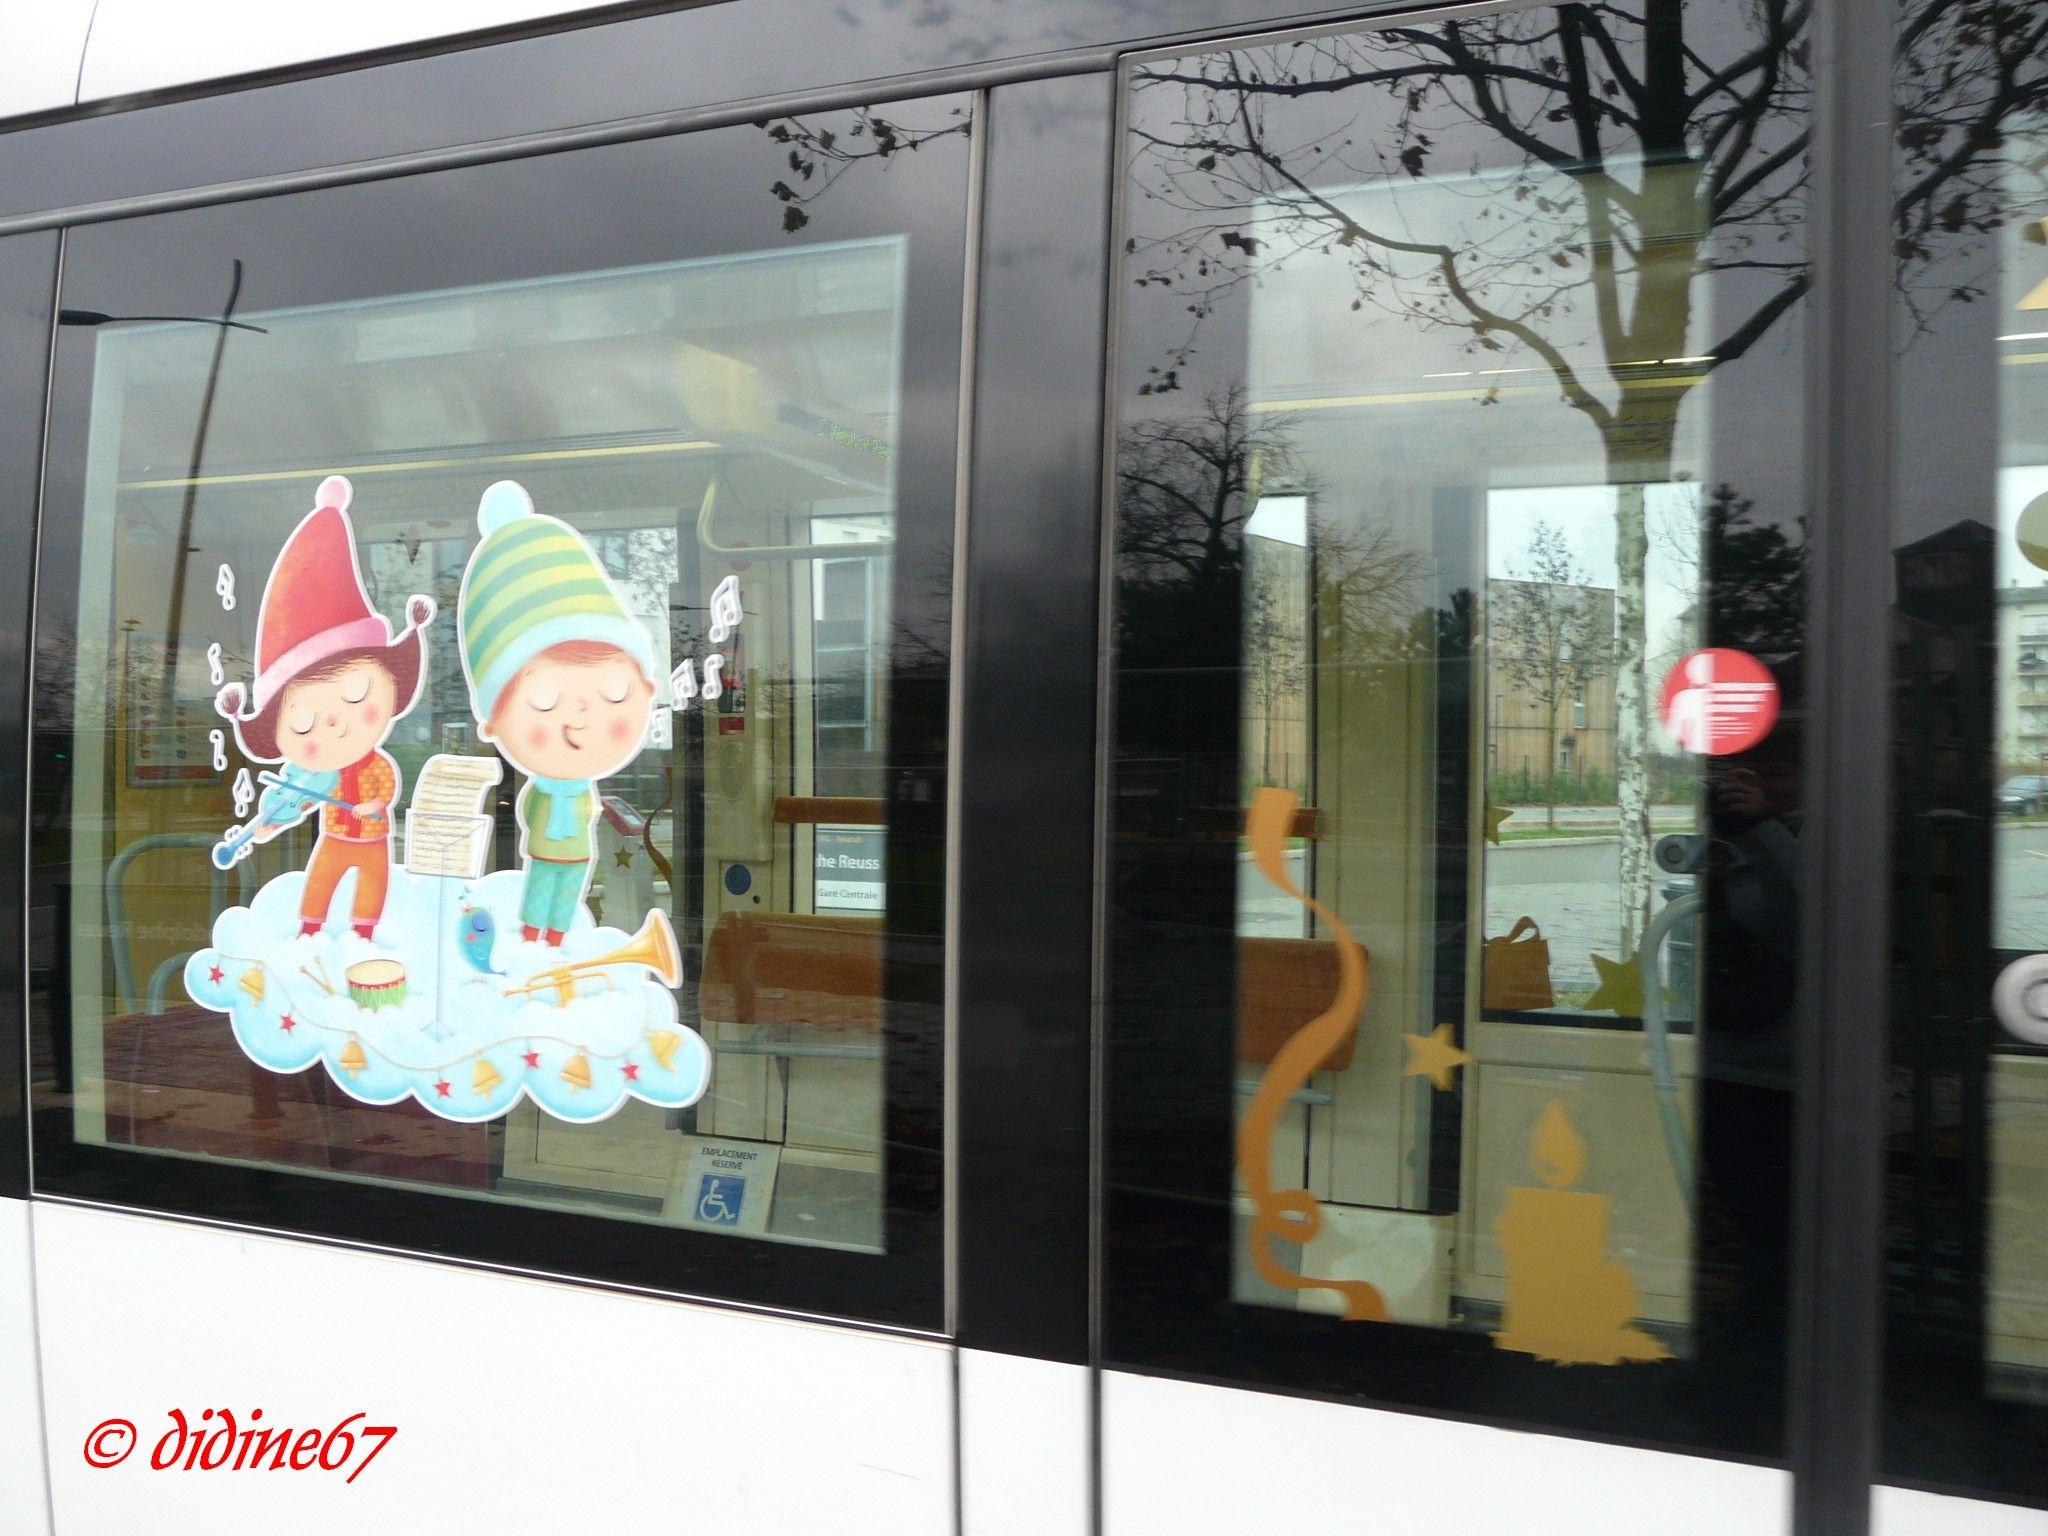 #A92D22 Tramway Strasbourg Capitale De Noël 5517 décorations de noel strasbourg 2048x1536 px @ aertt.com